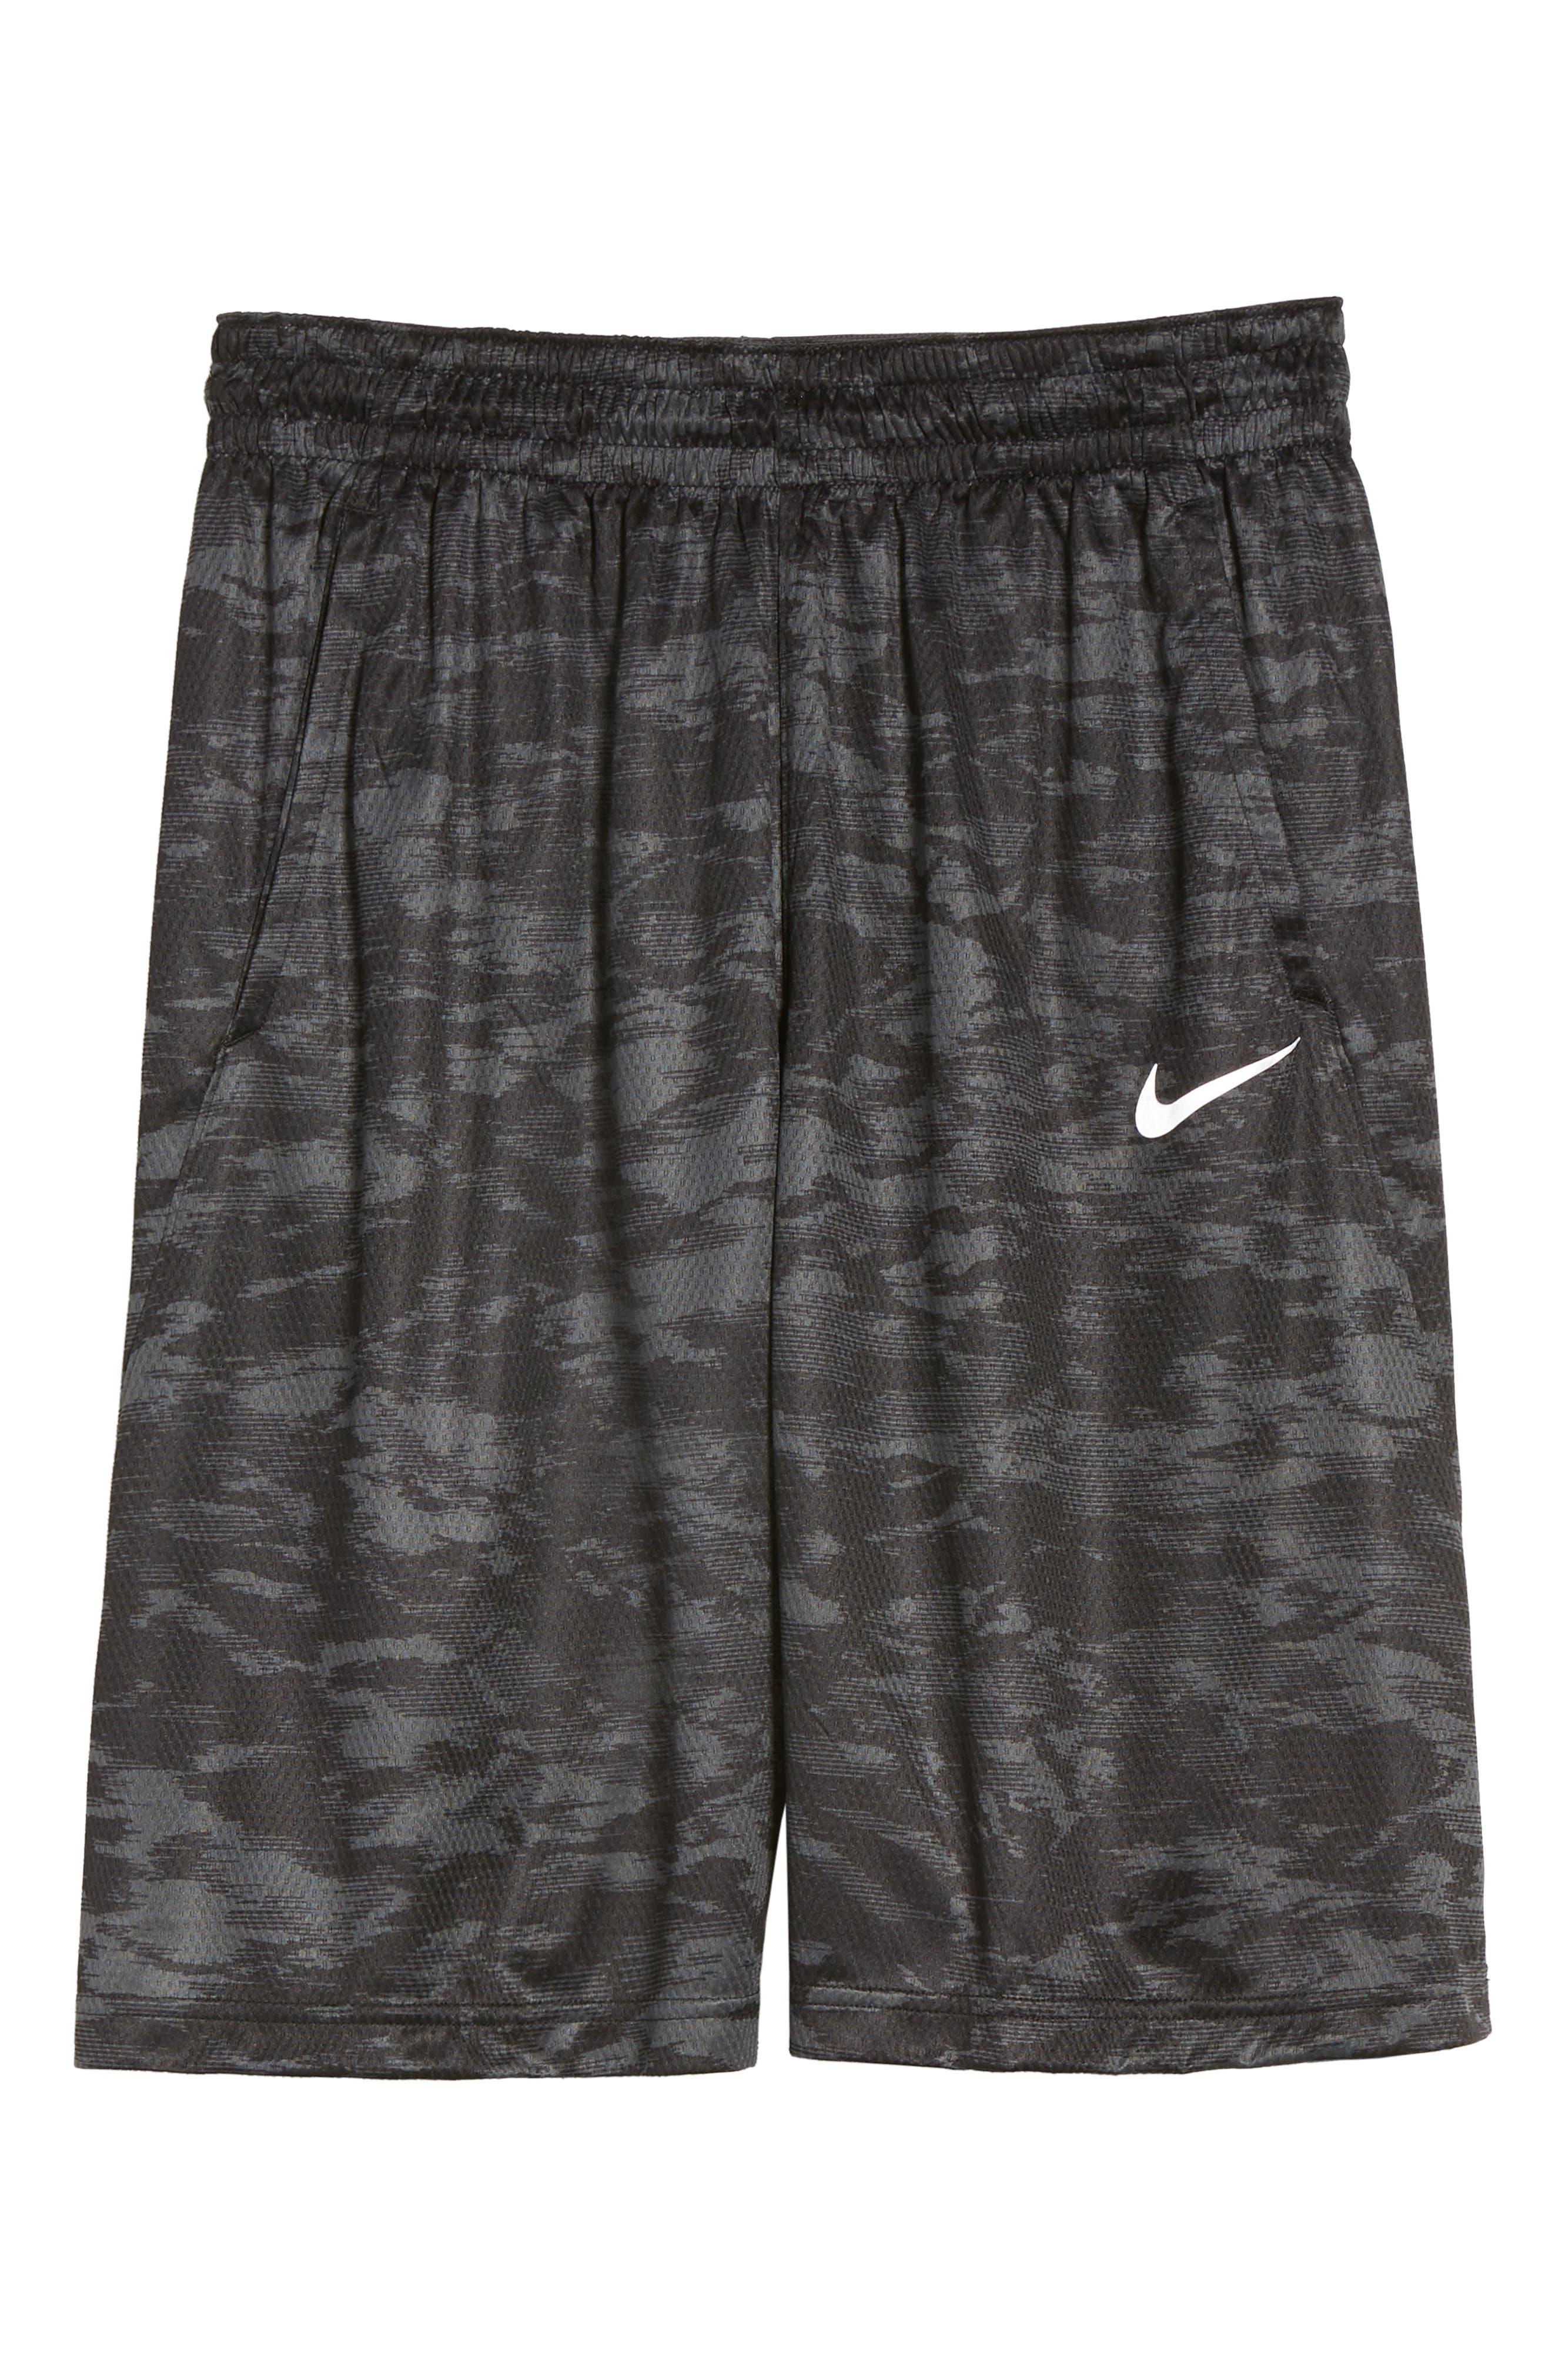 Dry Basketball Shorts,                             Alternate thumbnail 6, color,                             060